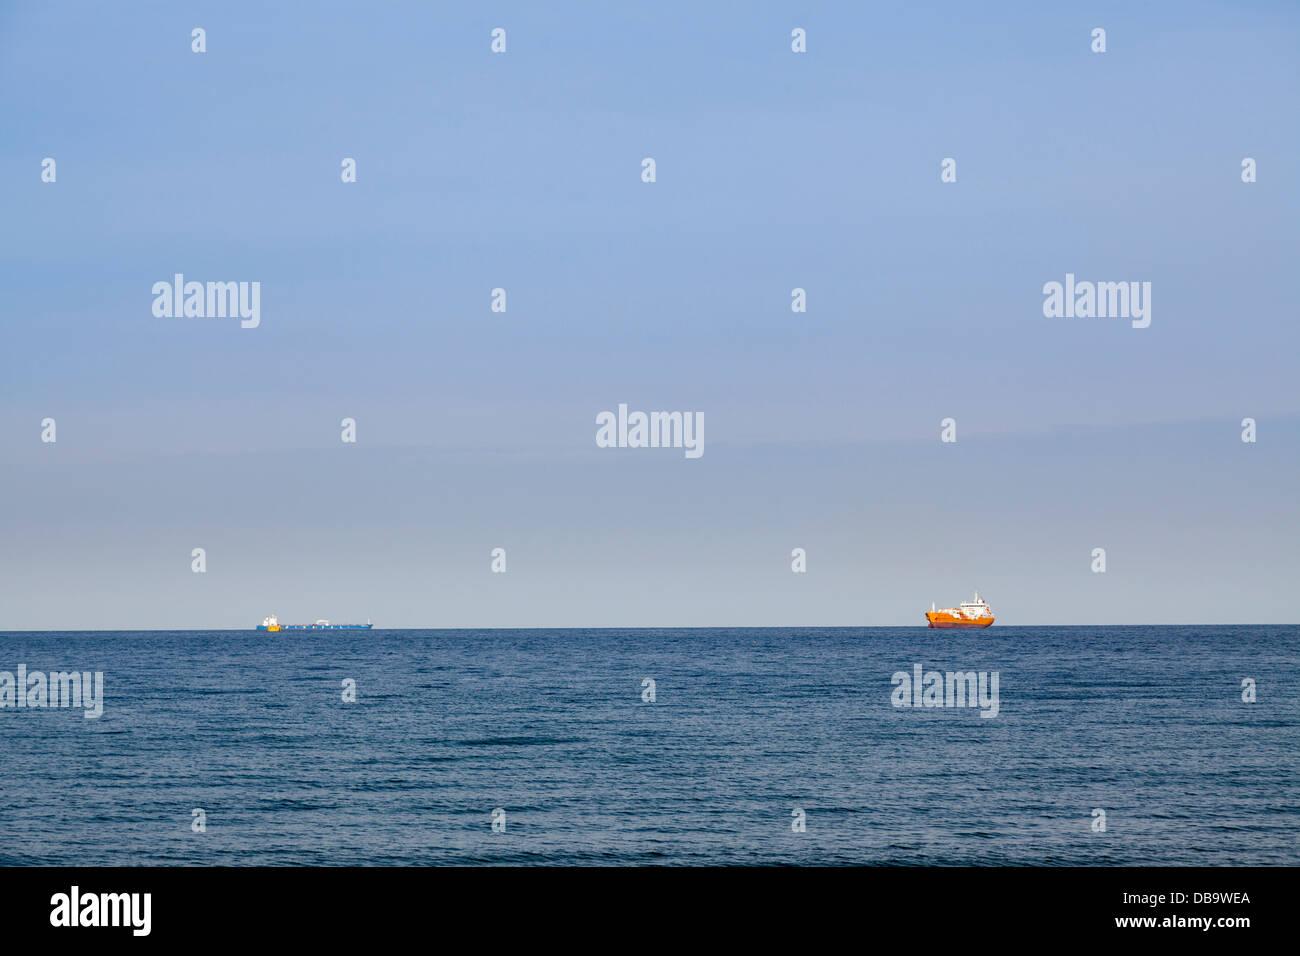 Container-Schiffe am Horizont auf dem Meer. Stockbild